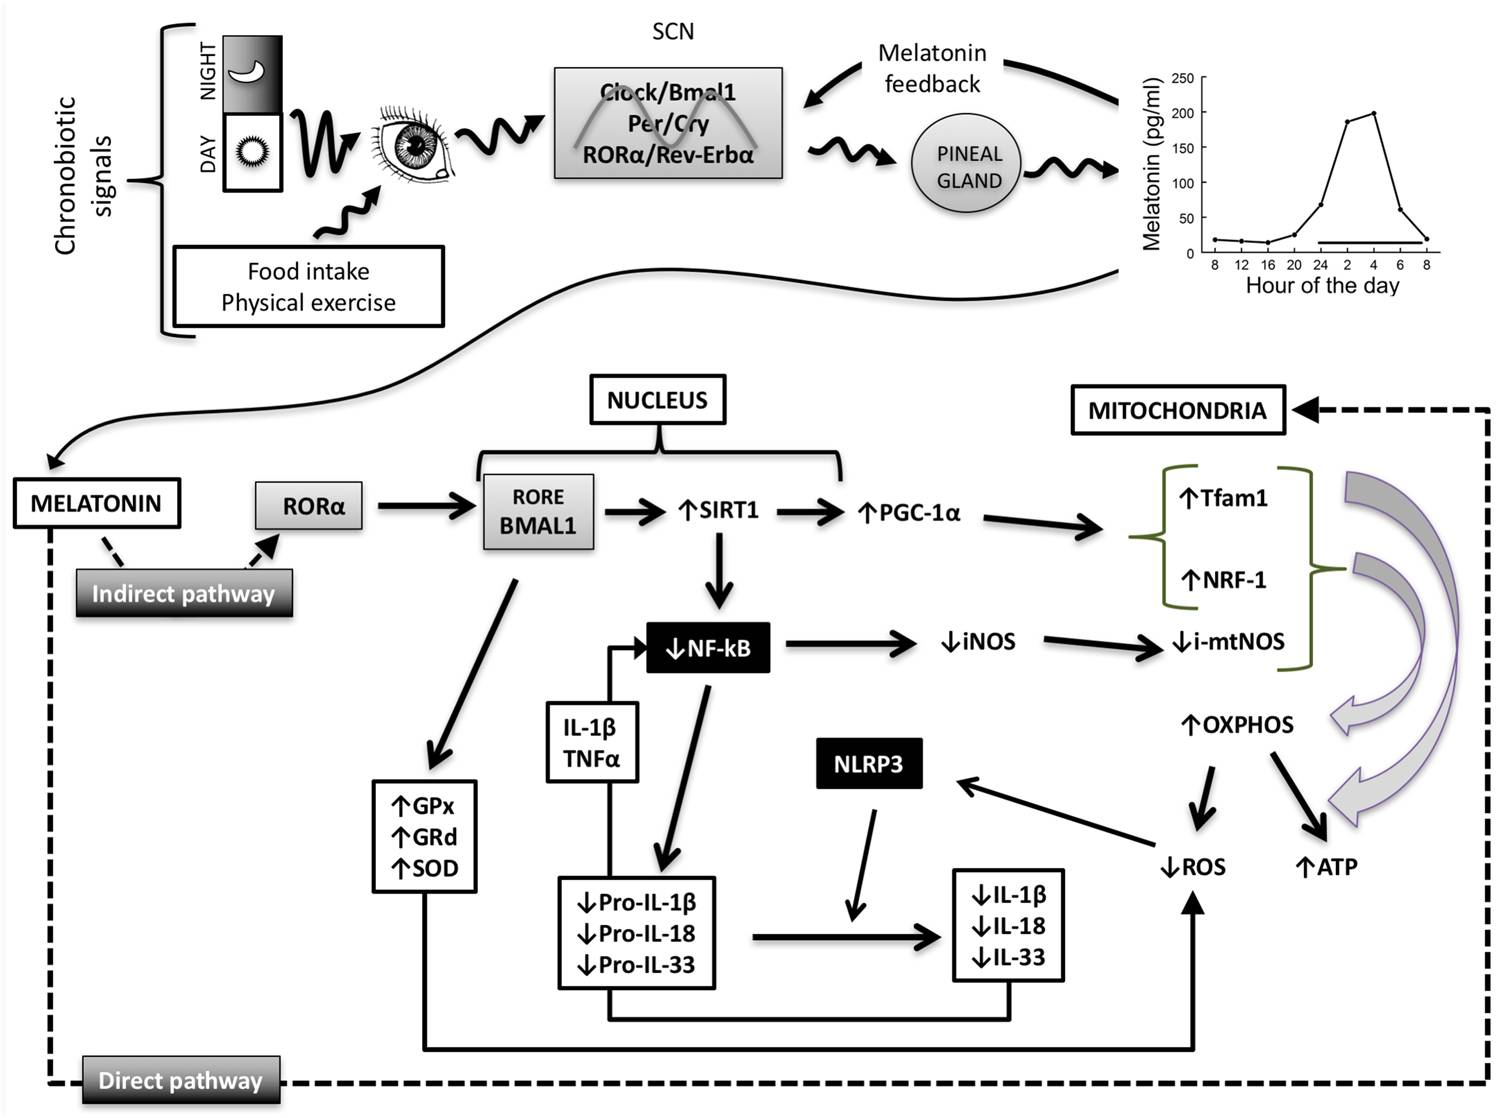 Melatonin, clock genes and mitochondria in sepsis